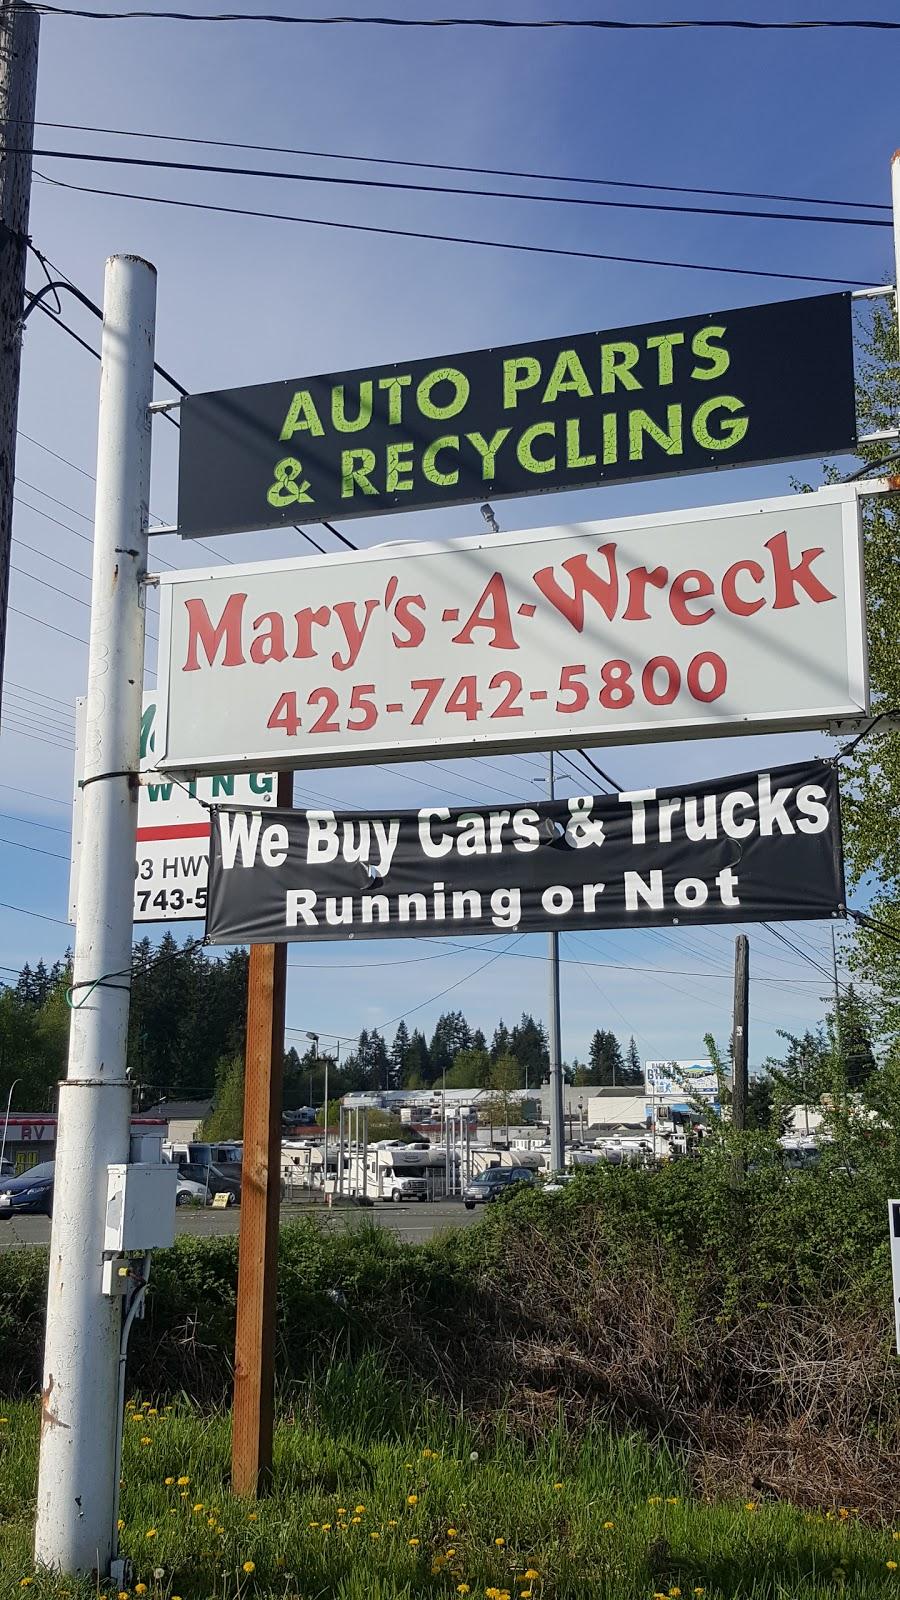 Marys-A-Wreck Auto Parts - car repair    Photo 3 of 6   Address: 13303 Hwy 99, Everett, WA 98204, USA   Phone: (425) 742-5800